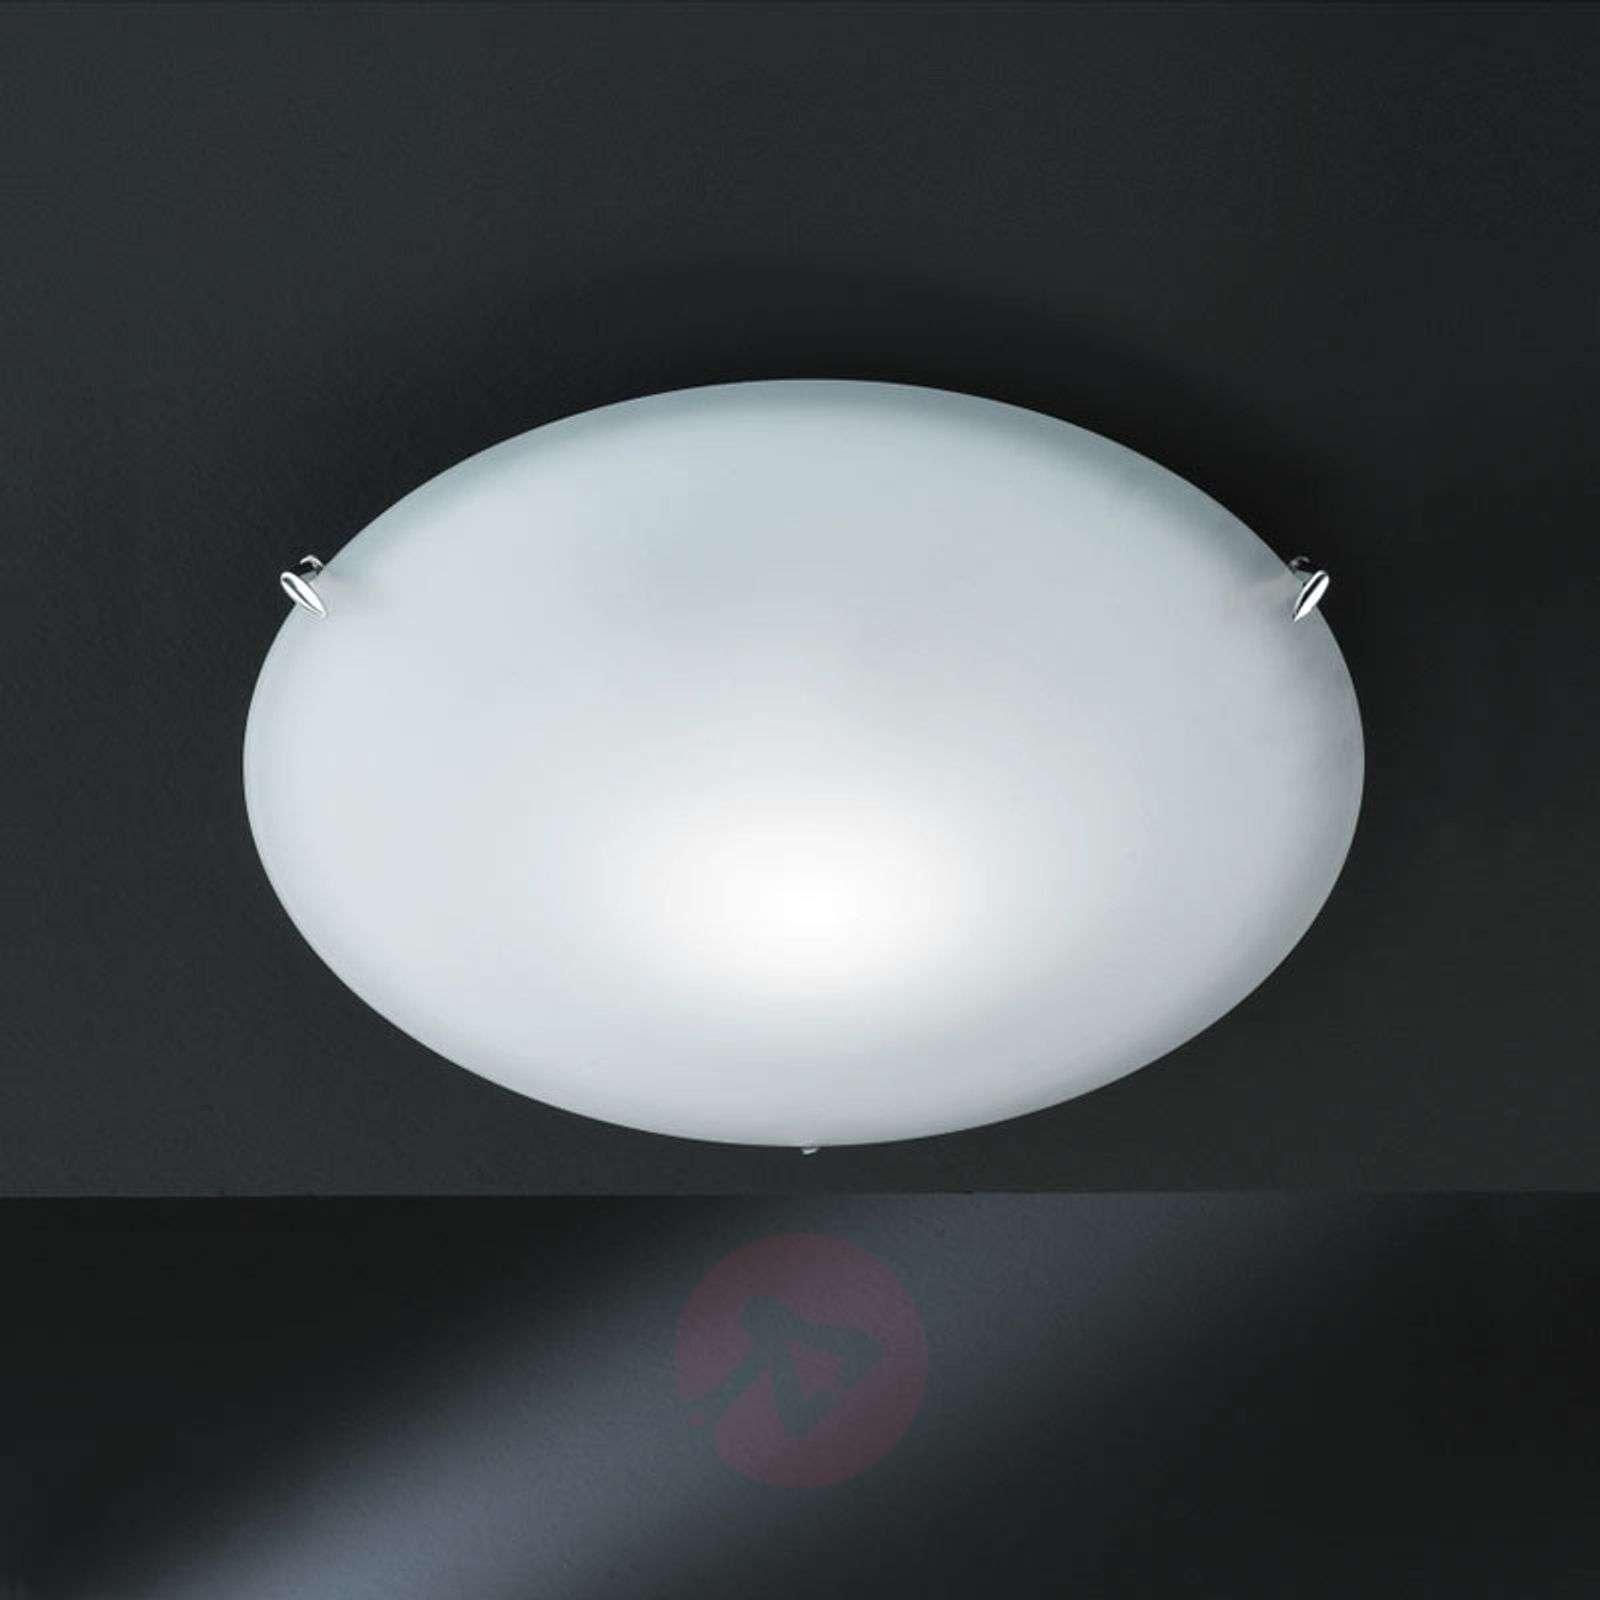 Glass ceiling lamp Assa II, diameter 43 cm-4580826-01